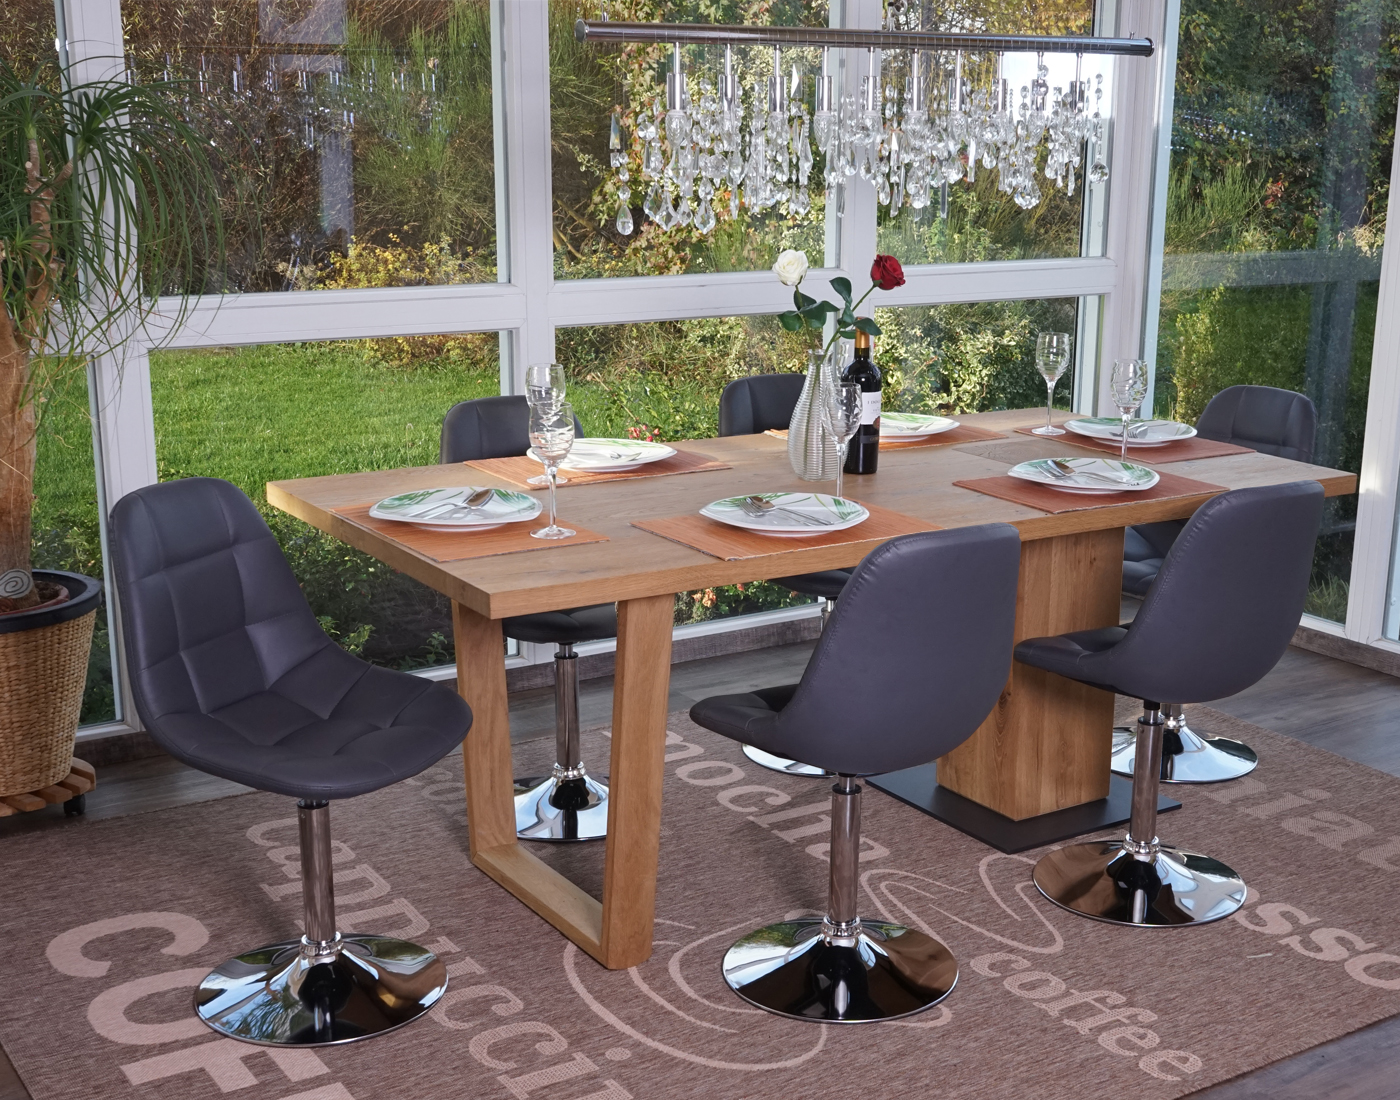 6x esszimmerstuhl hwc a60 drehstuhl stuhl chrom ebay for Esszimmerstuhl drehstuhl